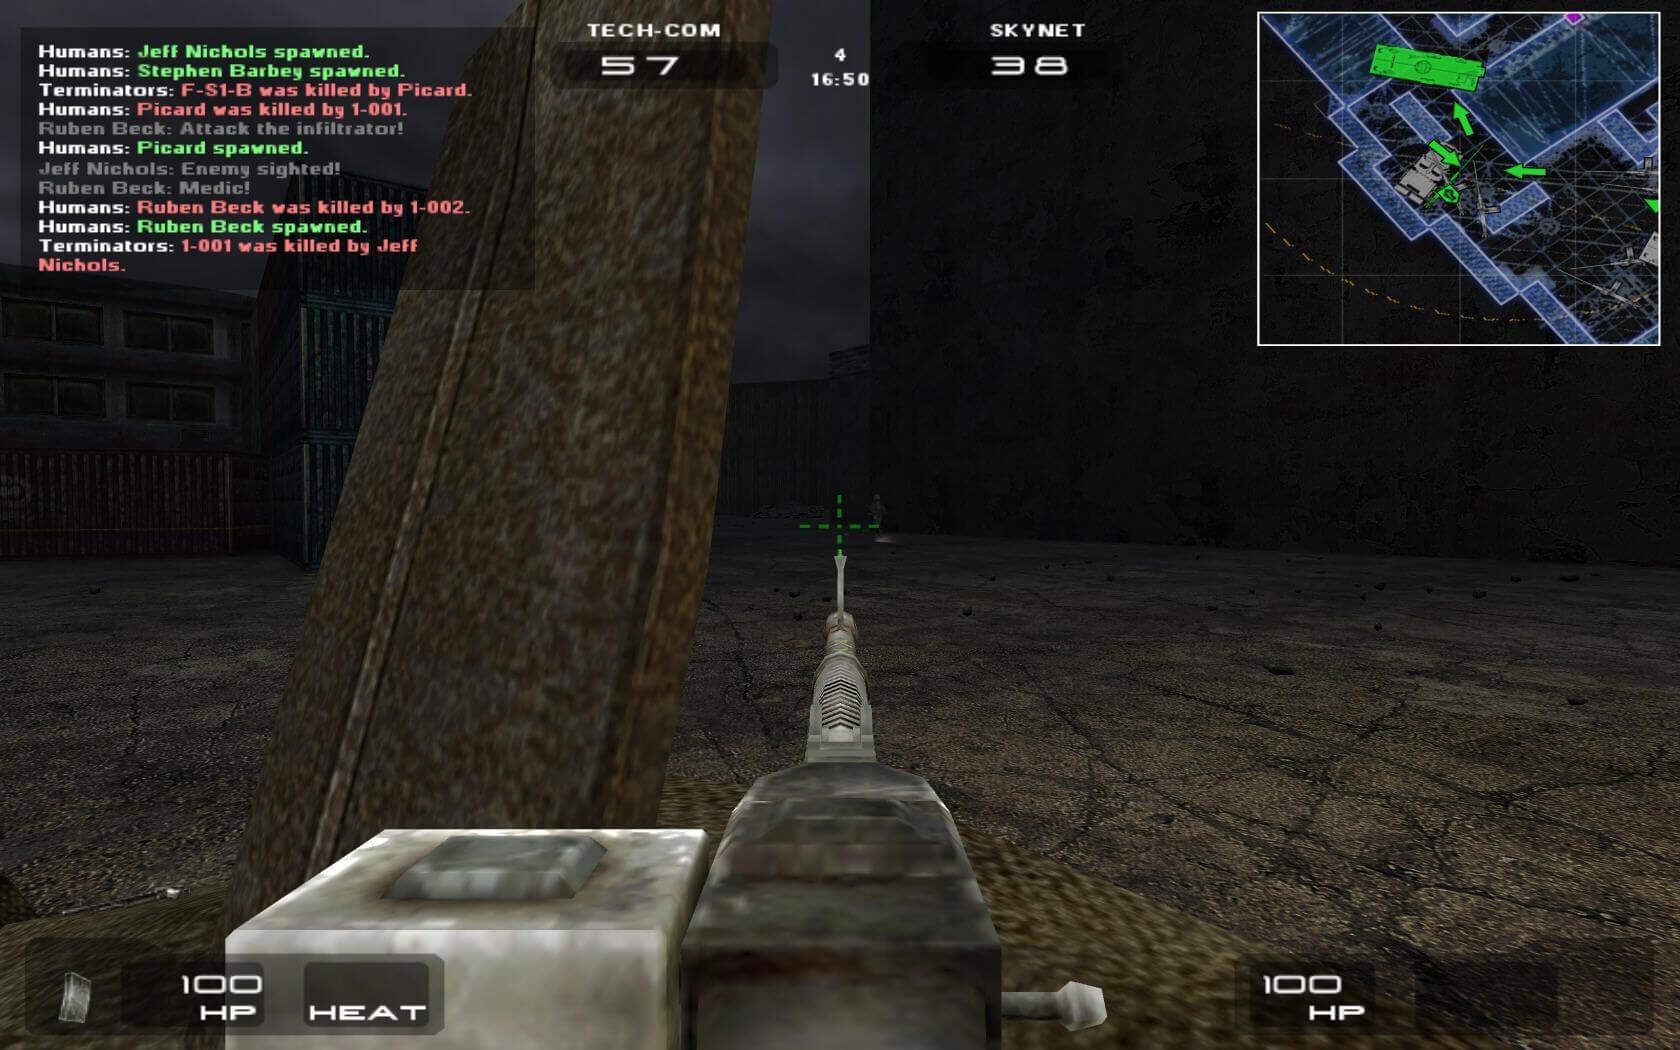 terminator 3 full movie free download in tamil